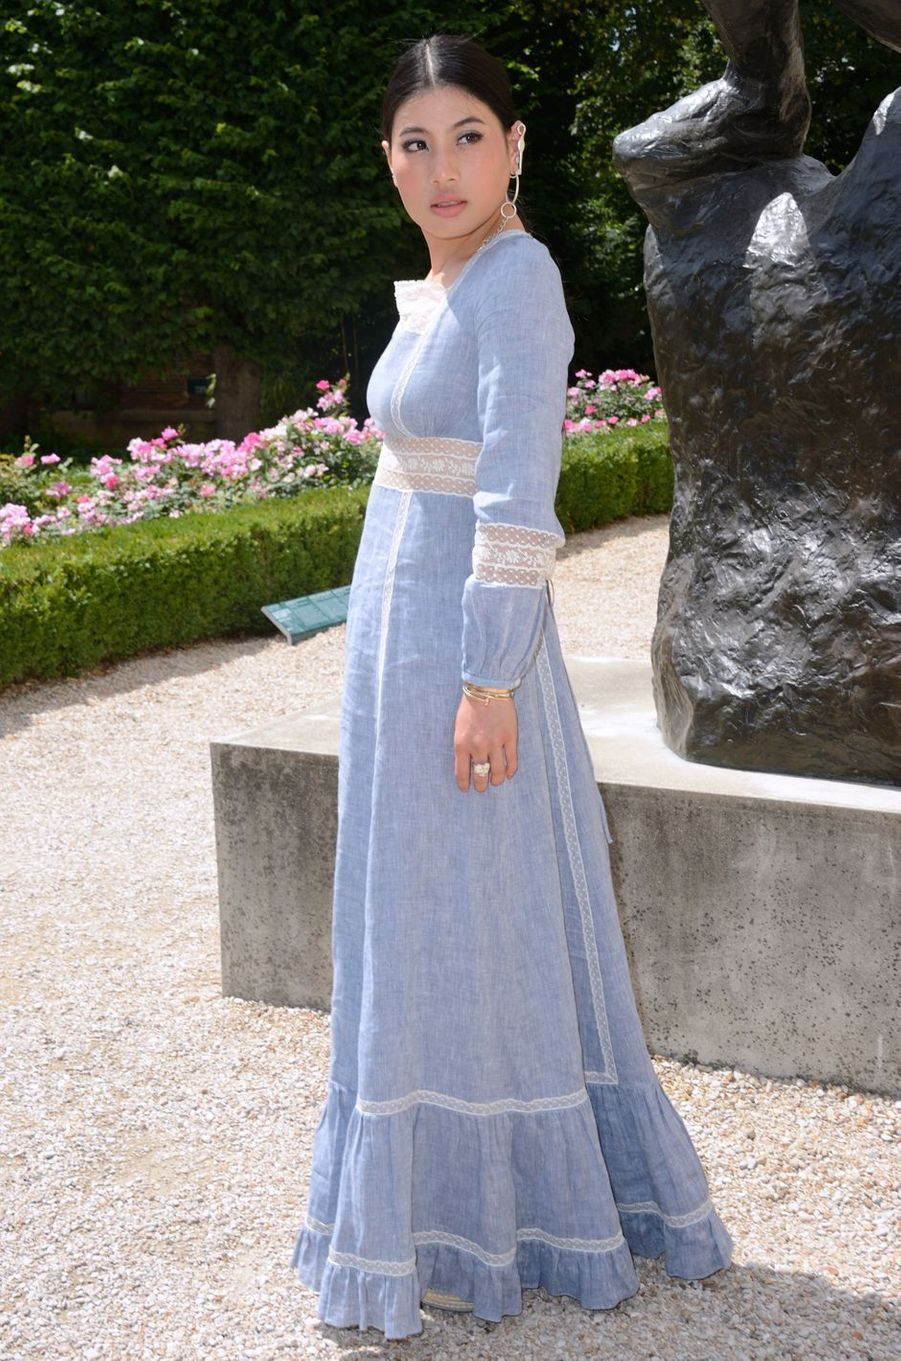 La princesse Sirivannavari Nariratana de Thaïlande à Paris, le 2 juillet 2018